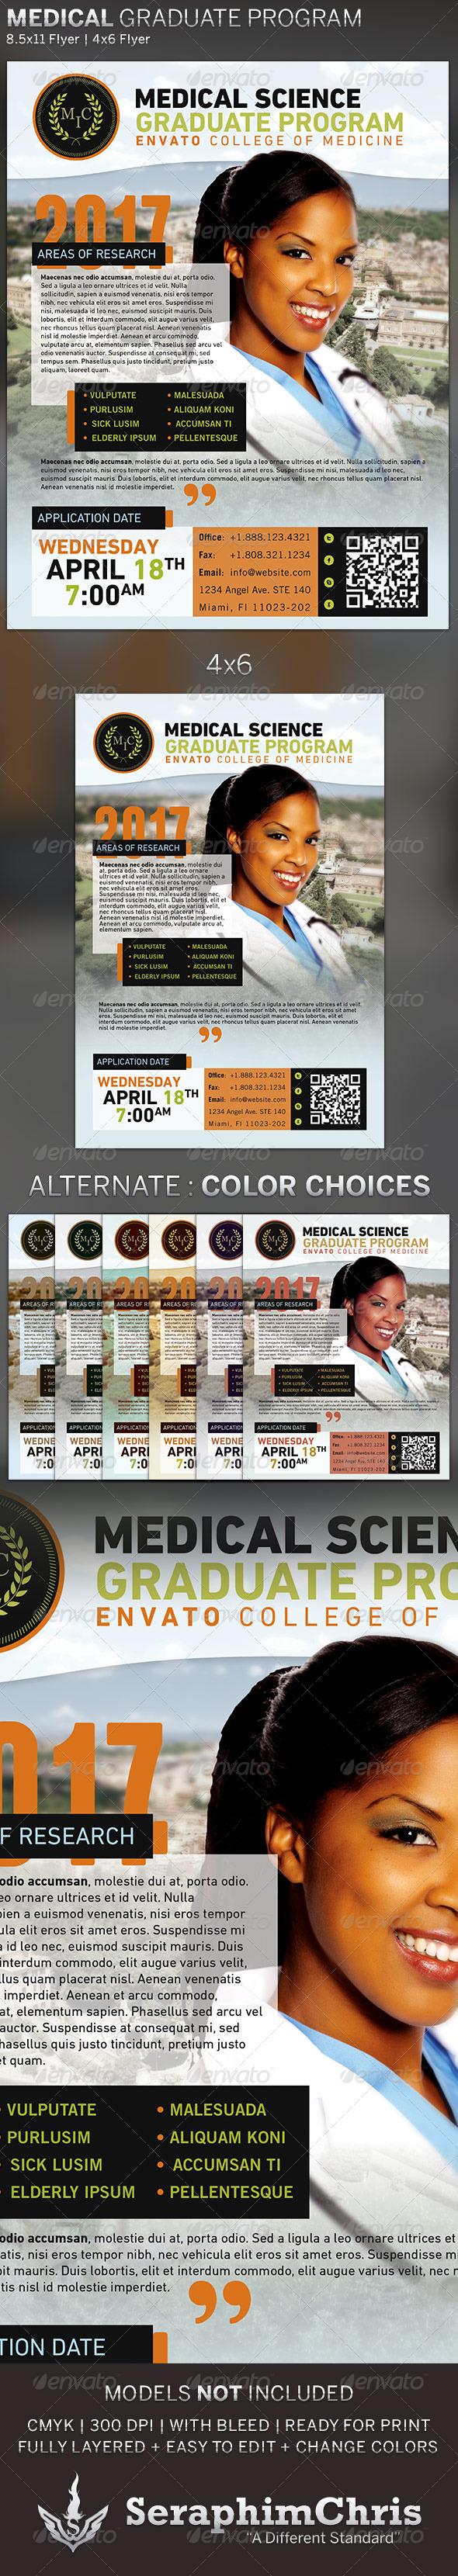 GraphicRiver Medical Graduate Program Flyer Template 5414988